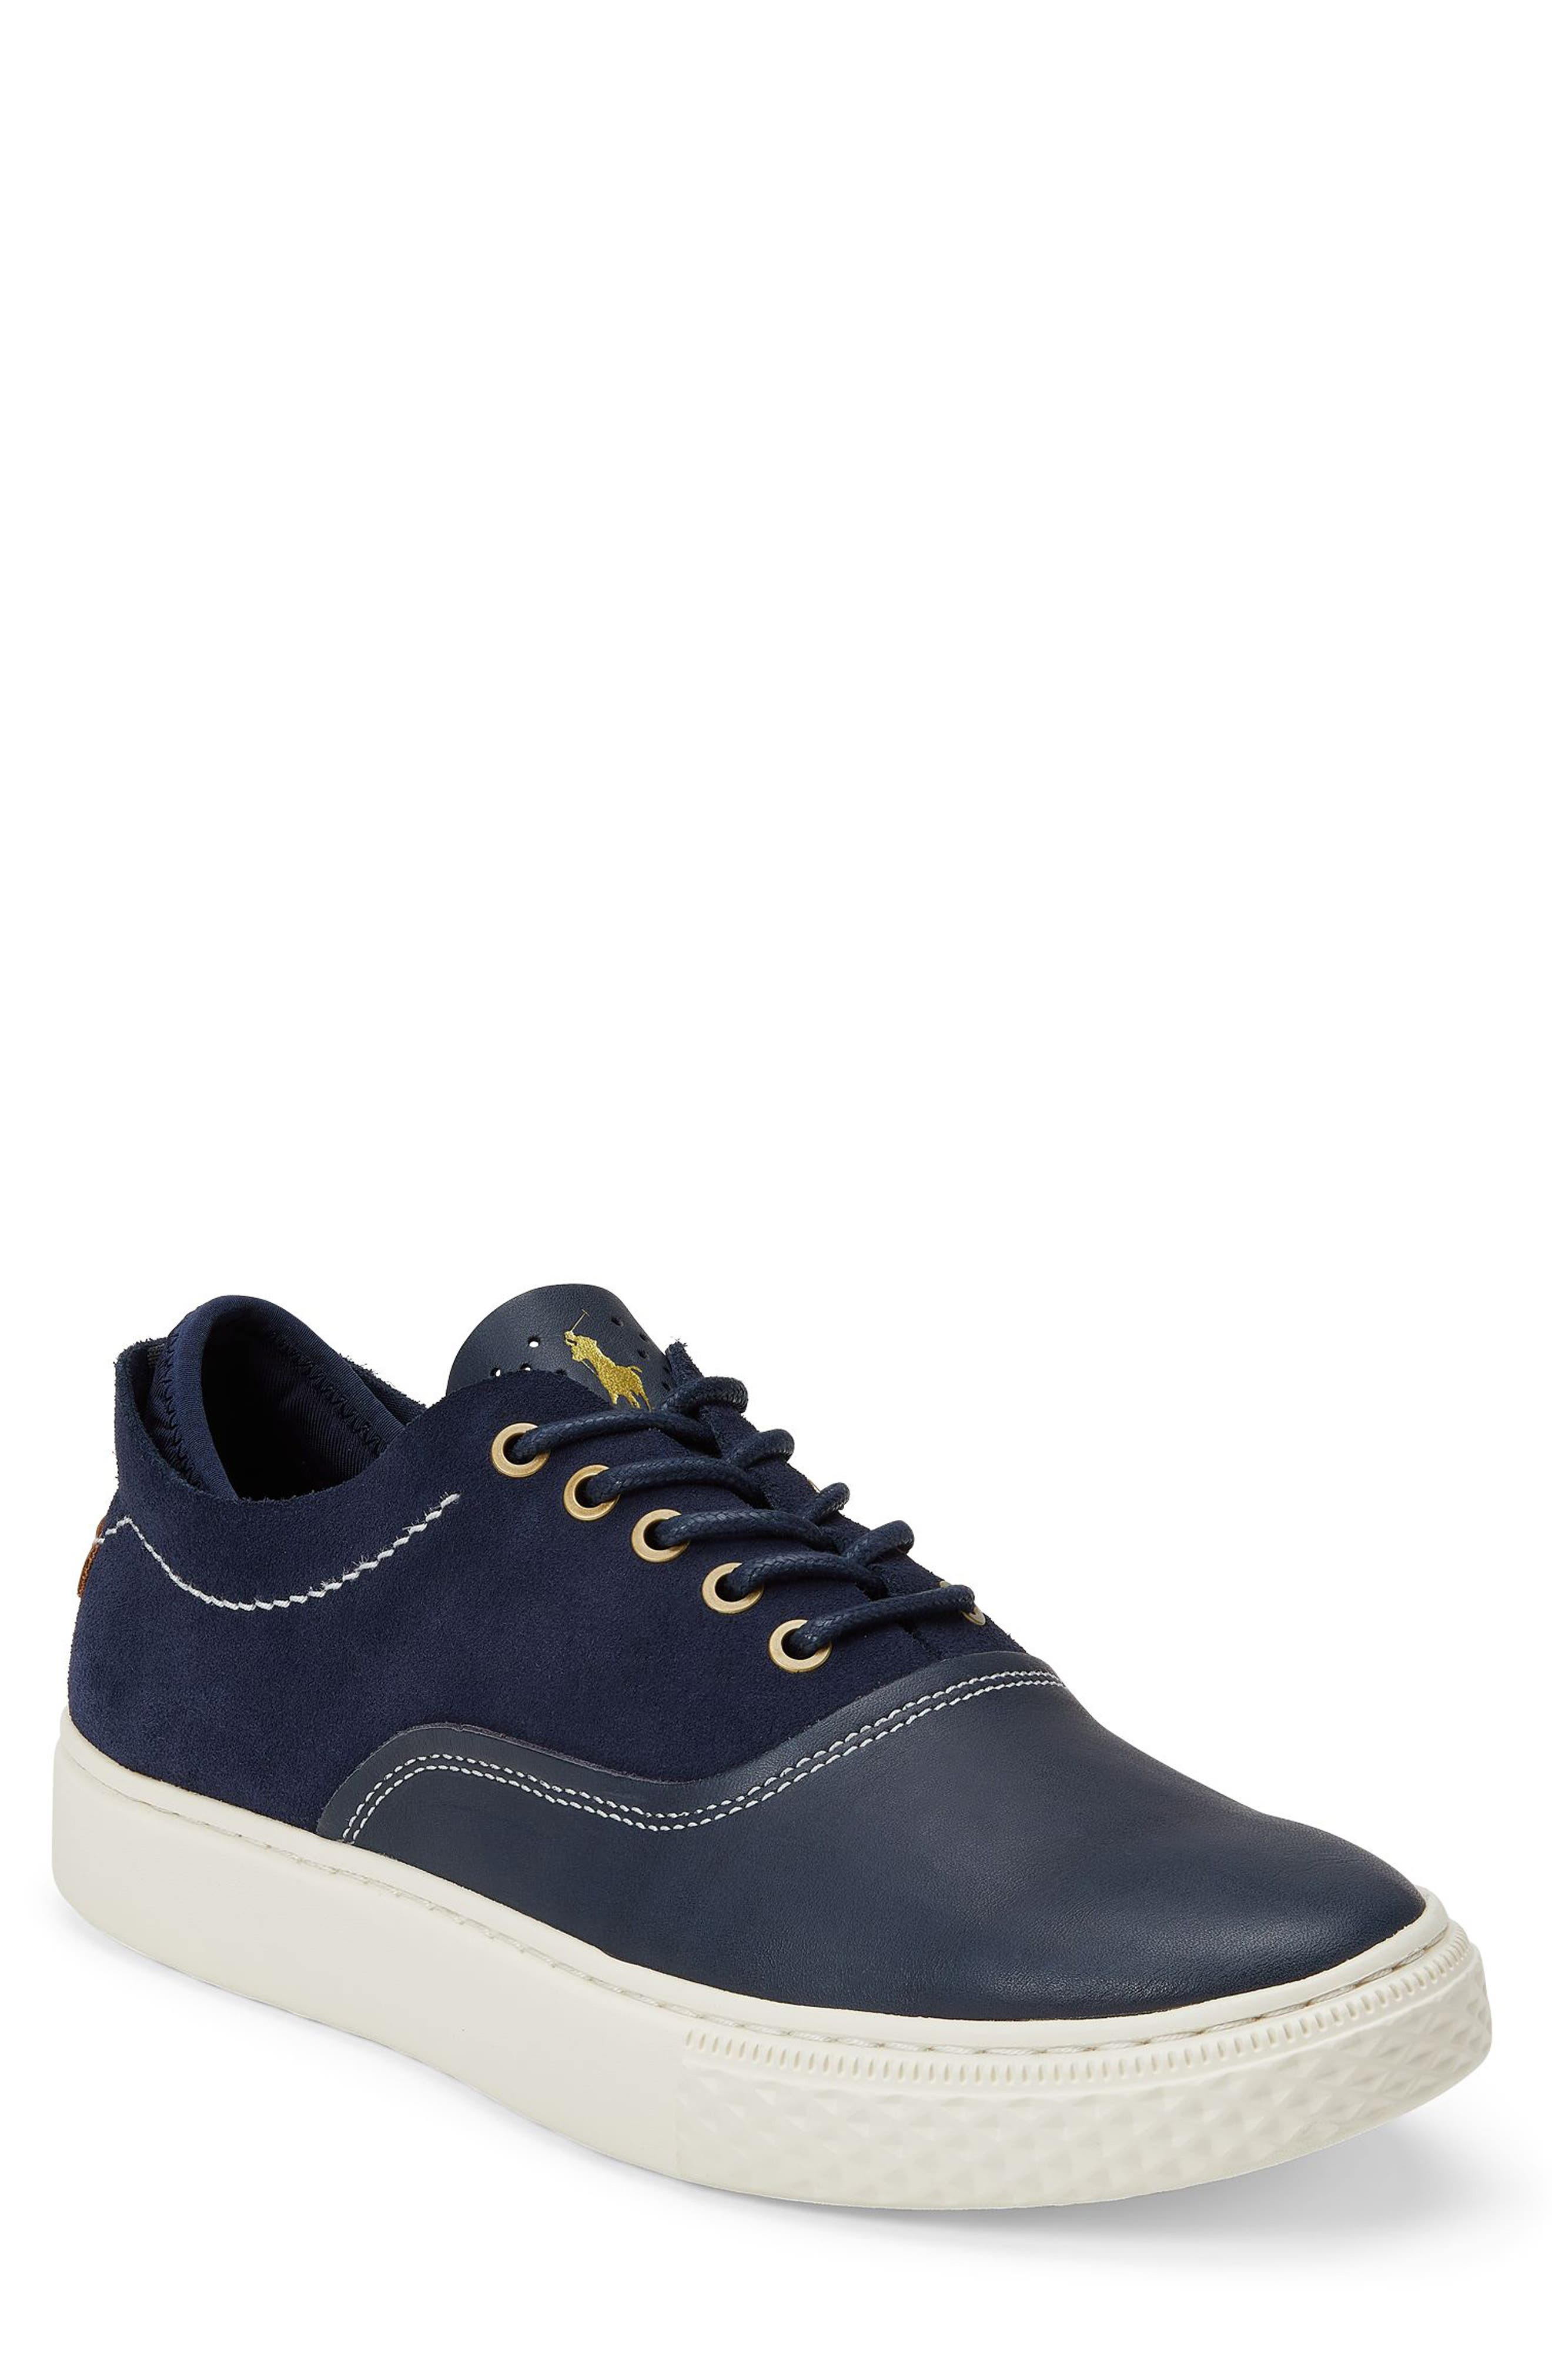 POLO RALPH LAUREN Thorton 100 Sneaker, Main, color, 410